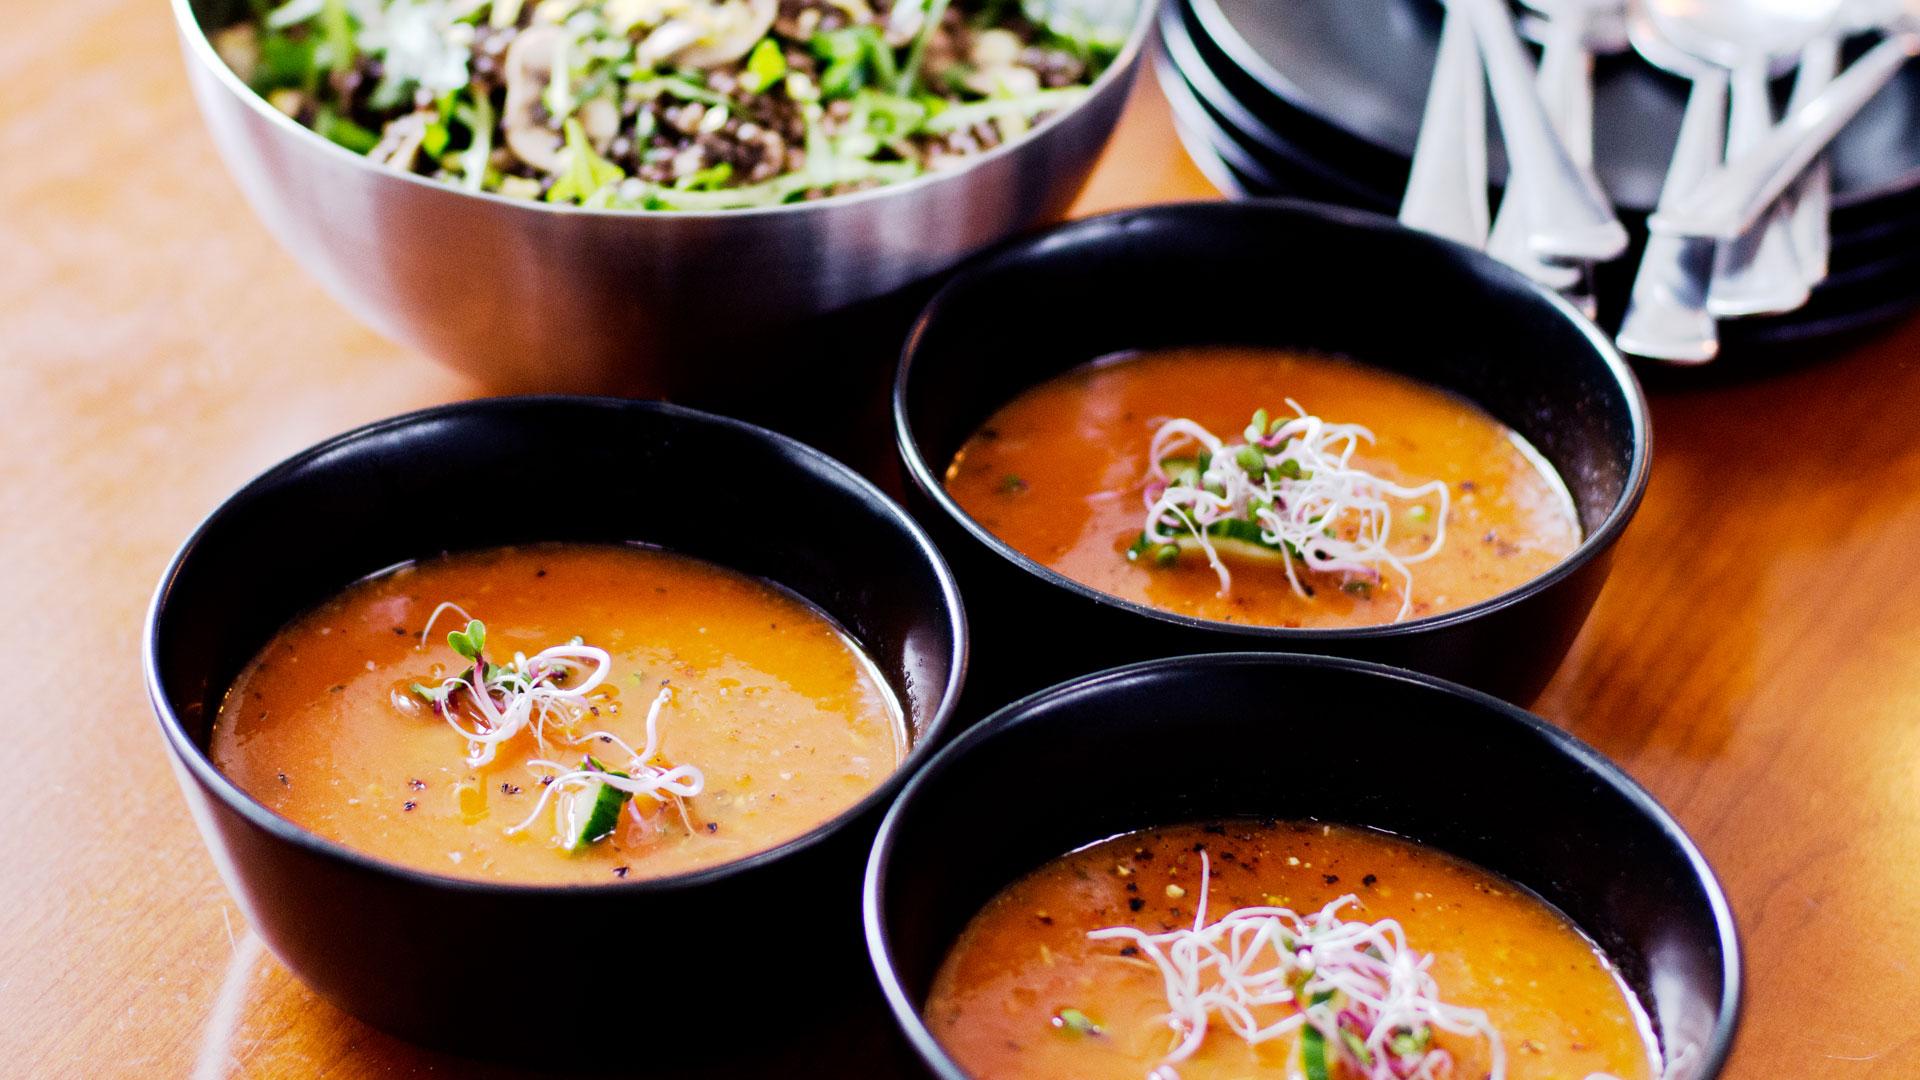 Nina's-delicous-healthy-vegan,-gluten-free-summer-Gazpacho-soup-recipe-in-bowls-Foodadit